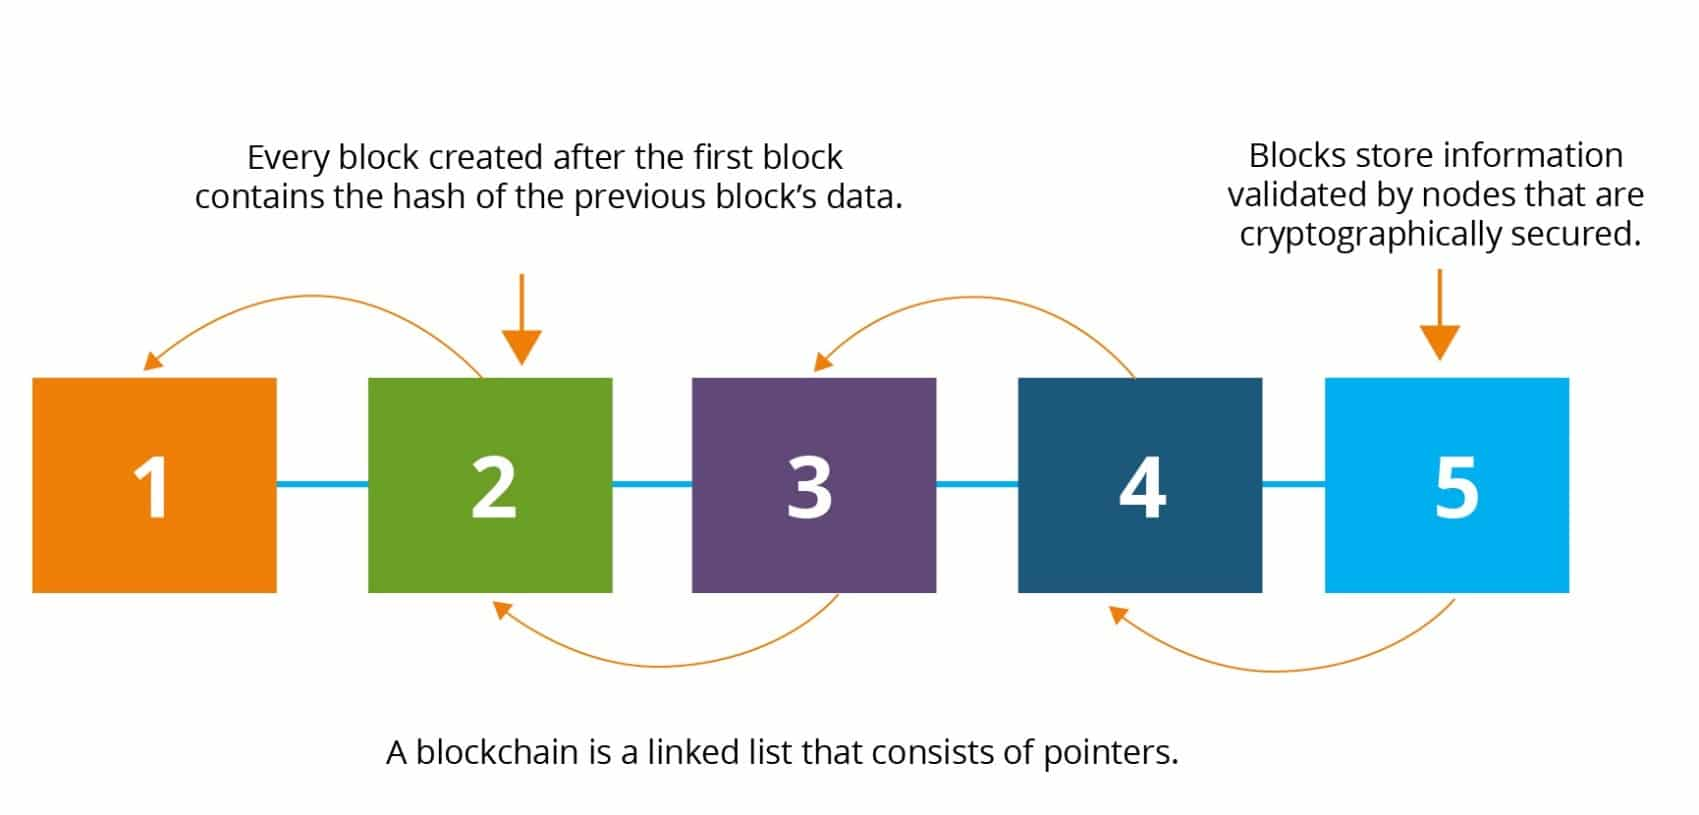 blockchain as linked list